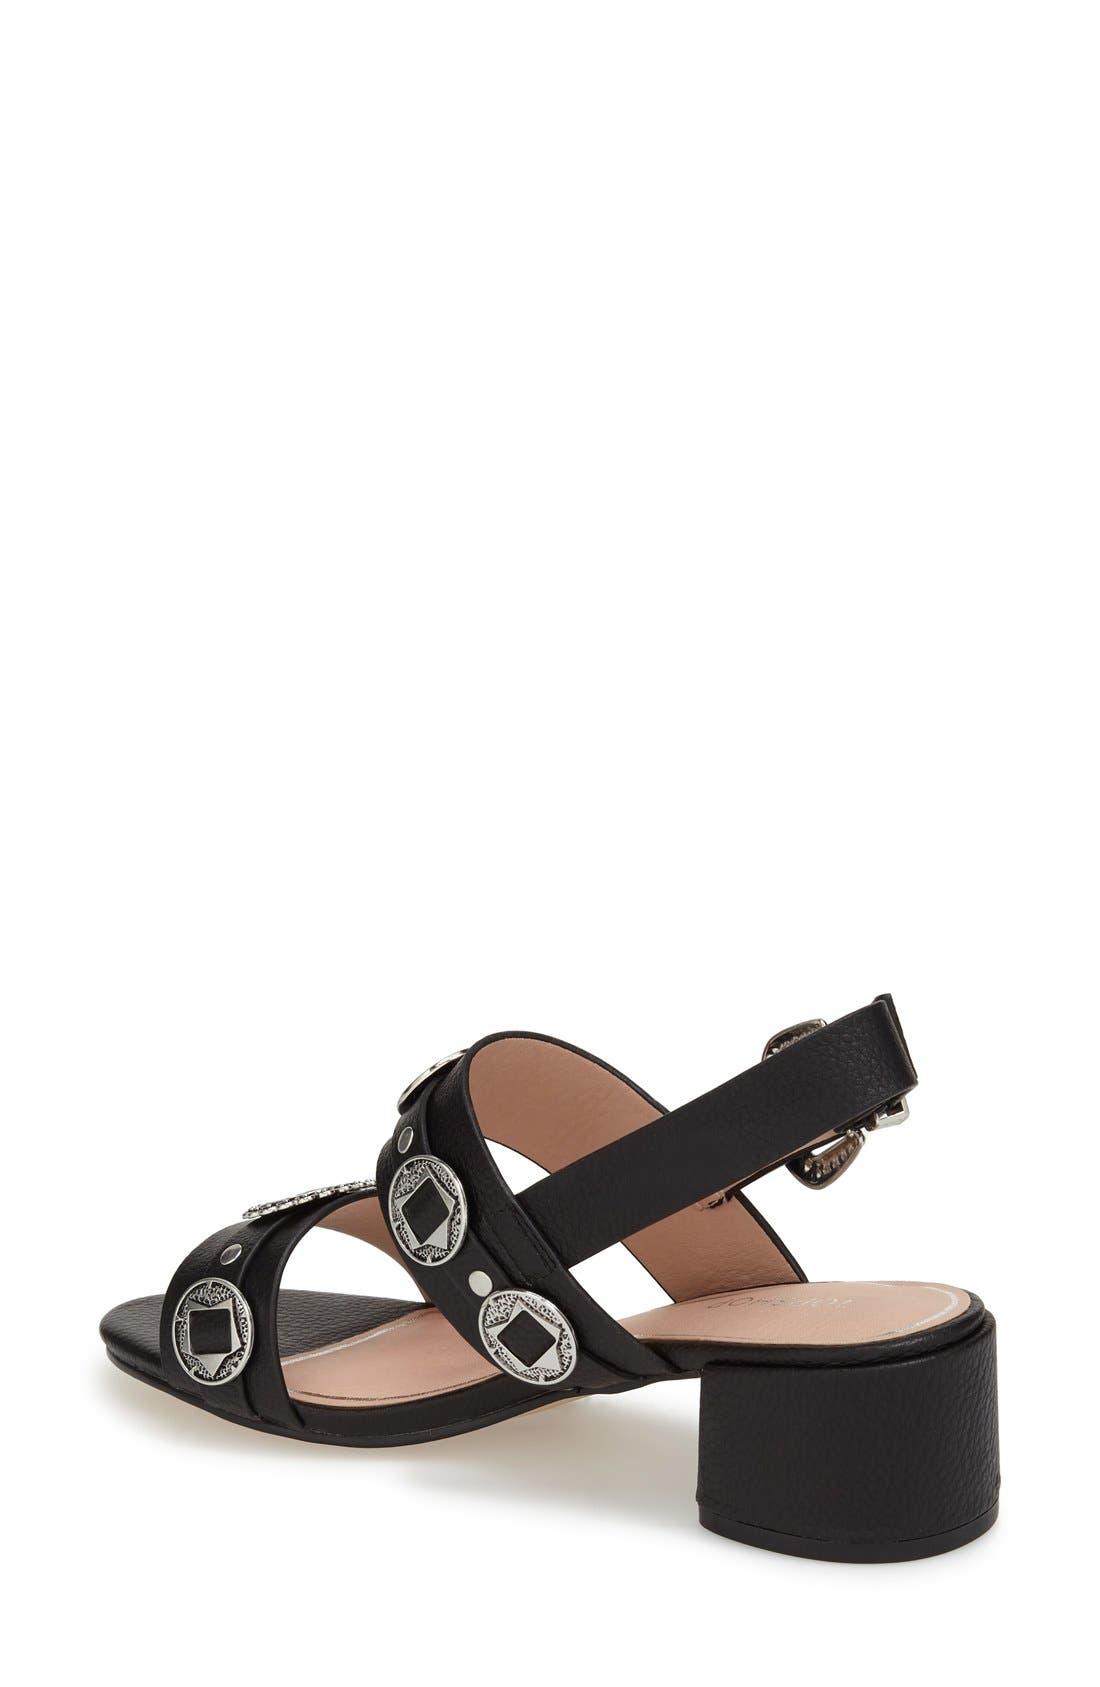 Alternate Image 3  - Topshop 'Dandy' Block Heel Sandal (Women)